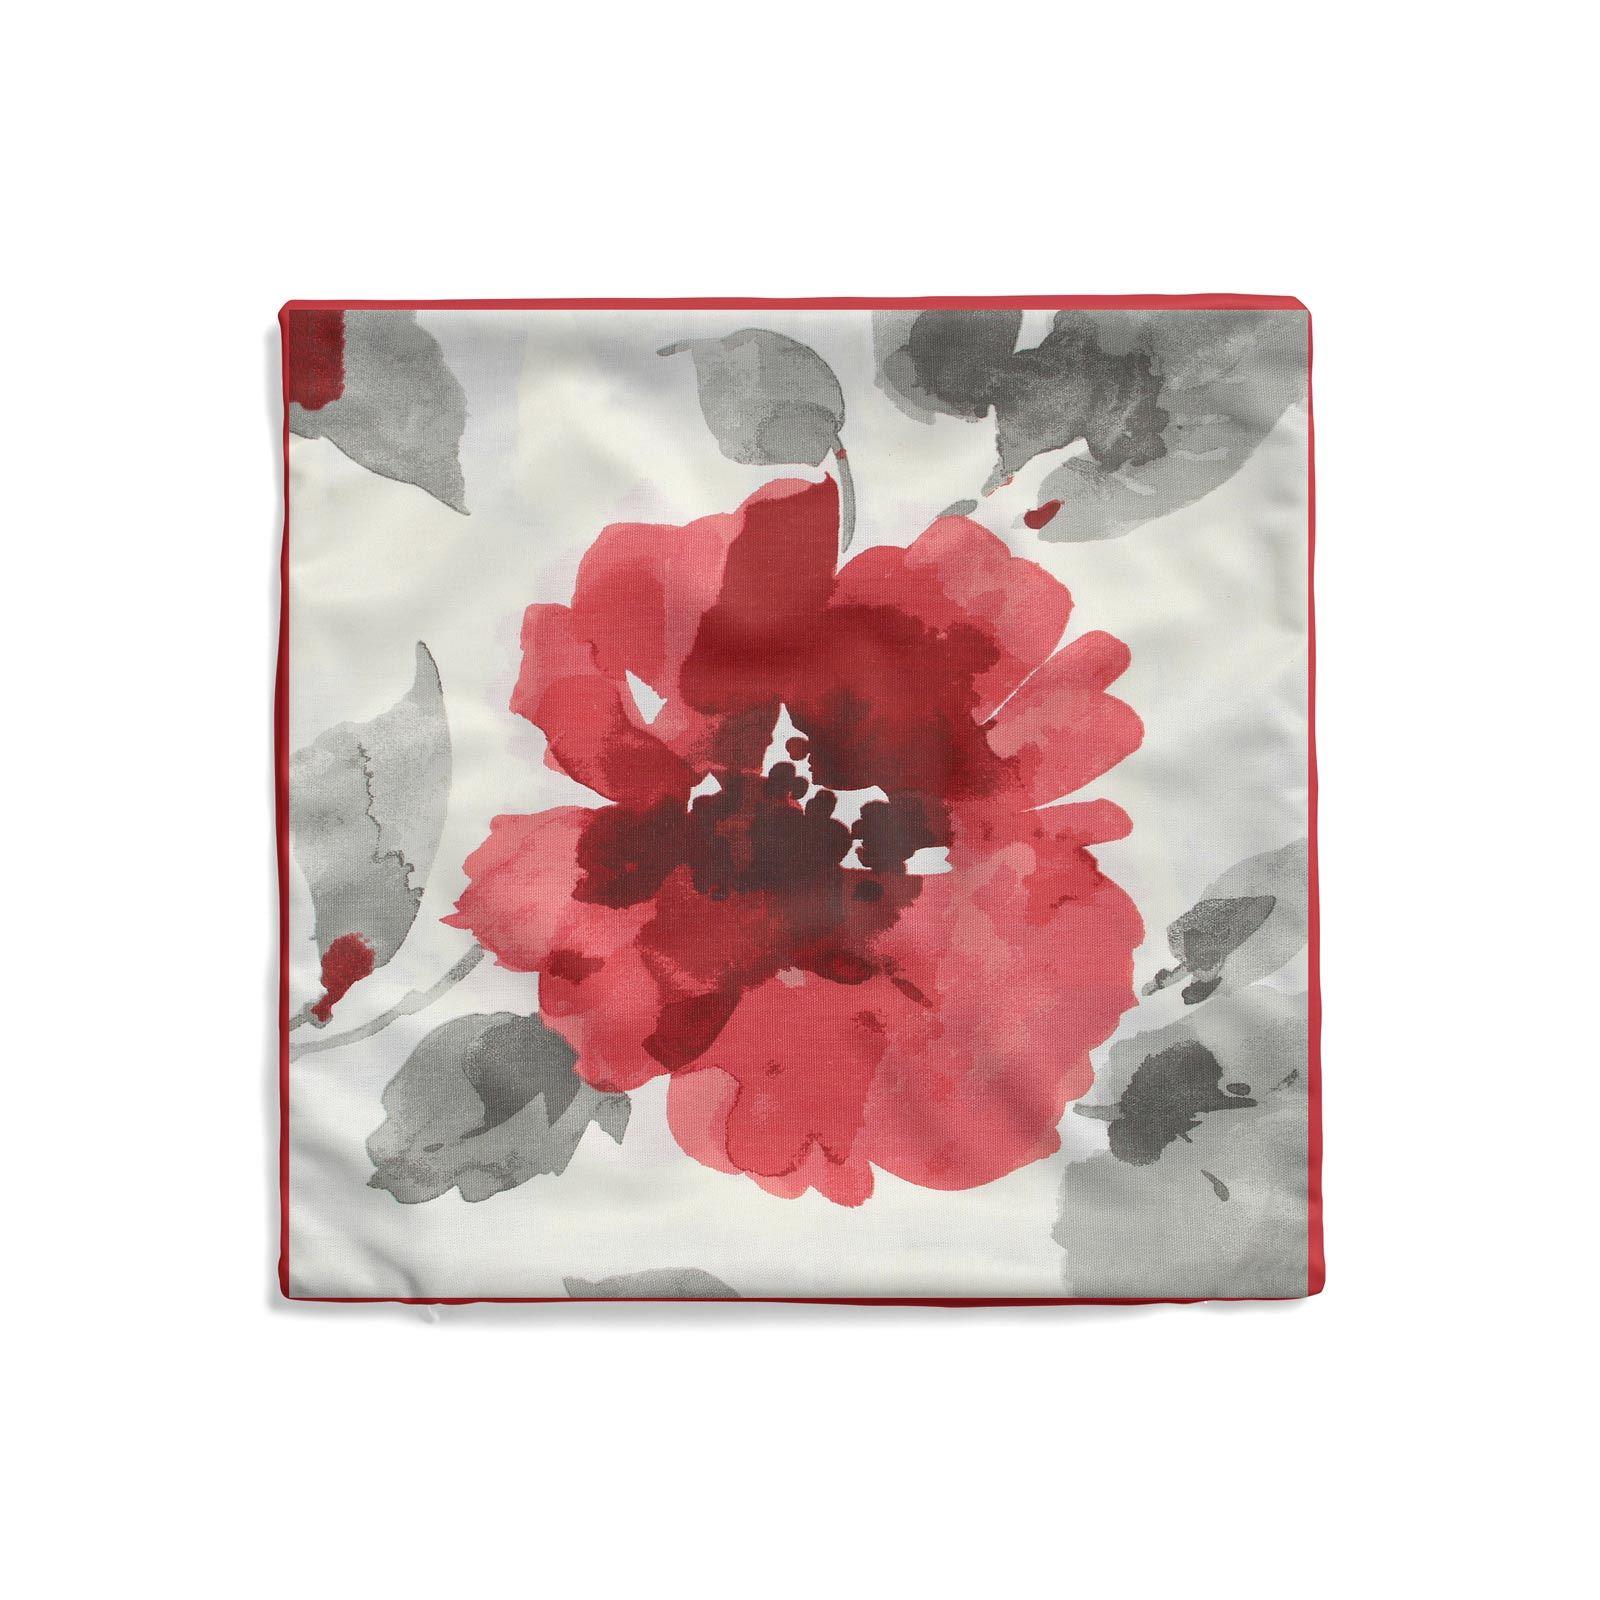 Vino-Tinto-Cushion-Covers-Coleccion-17-034-18-034-43cm-45cm-Cubierta miniatura 10